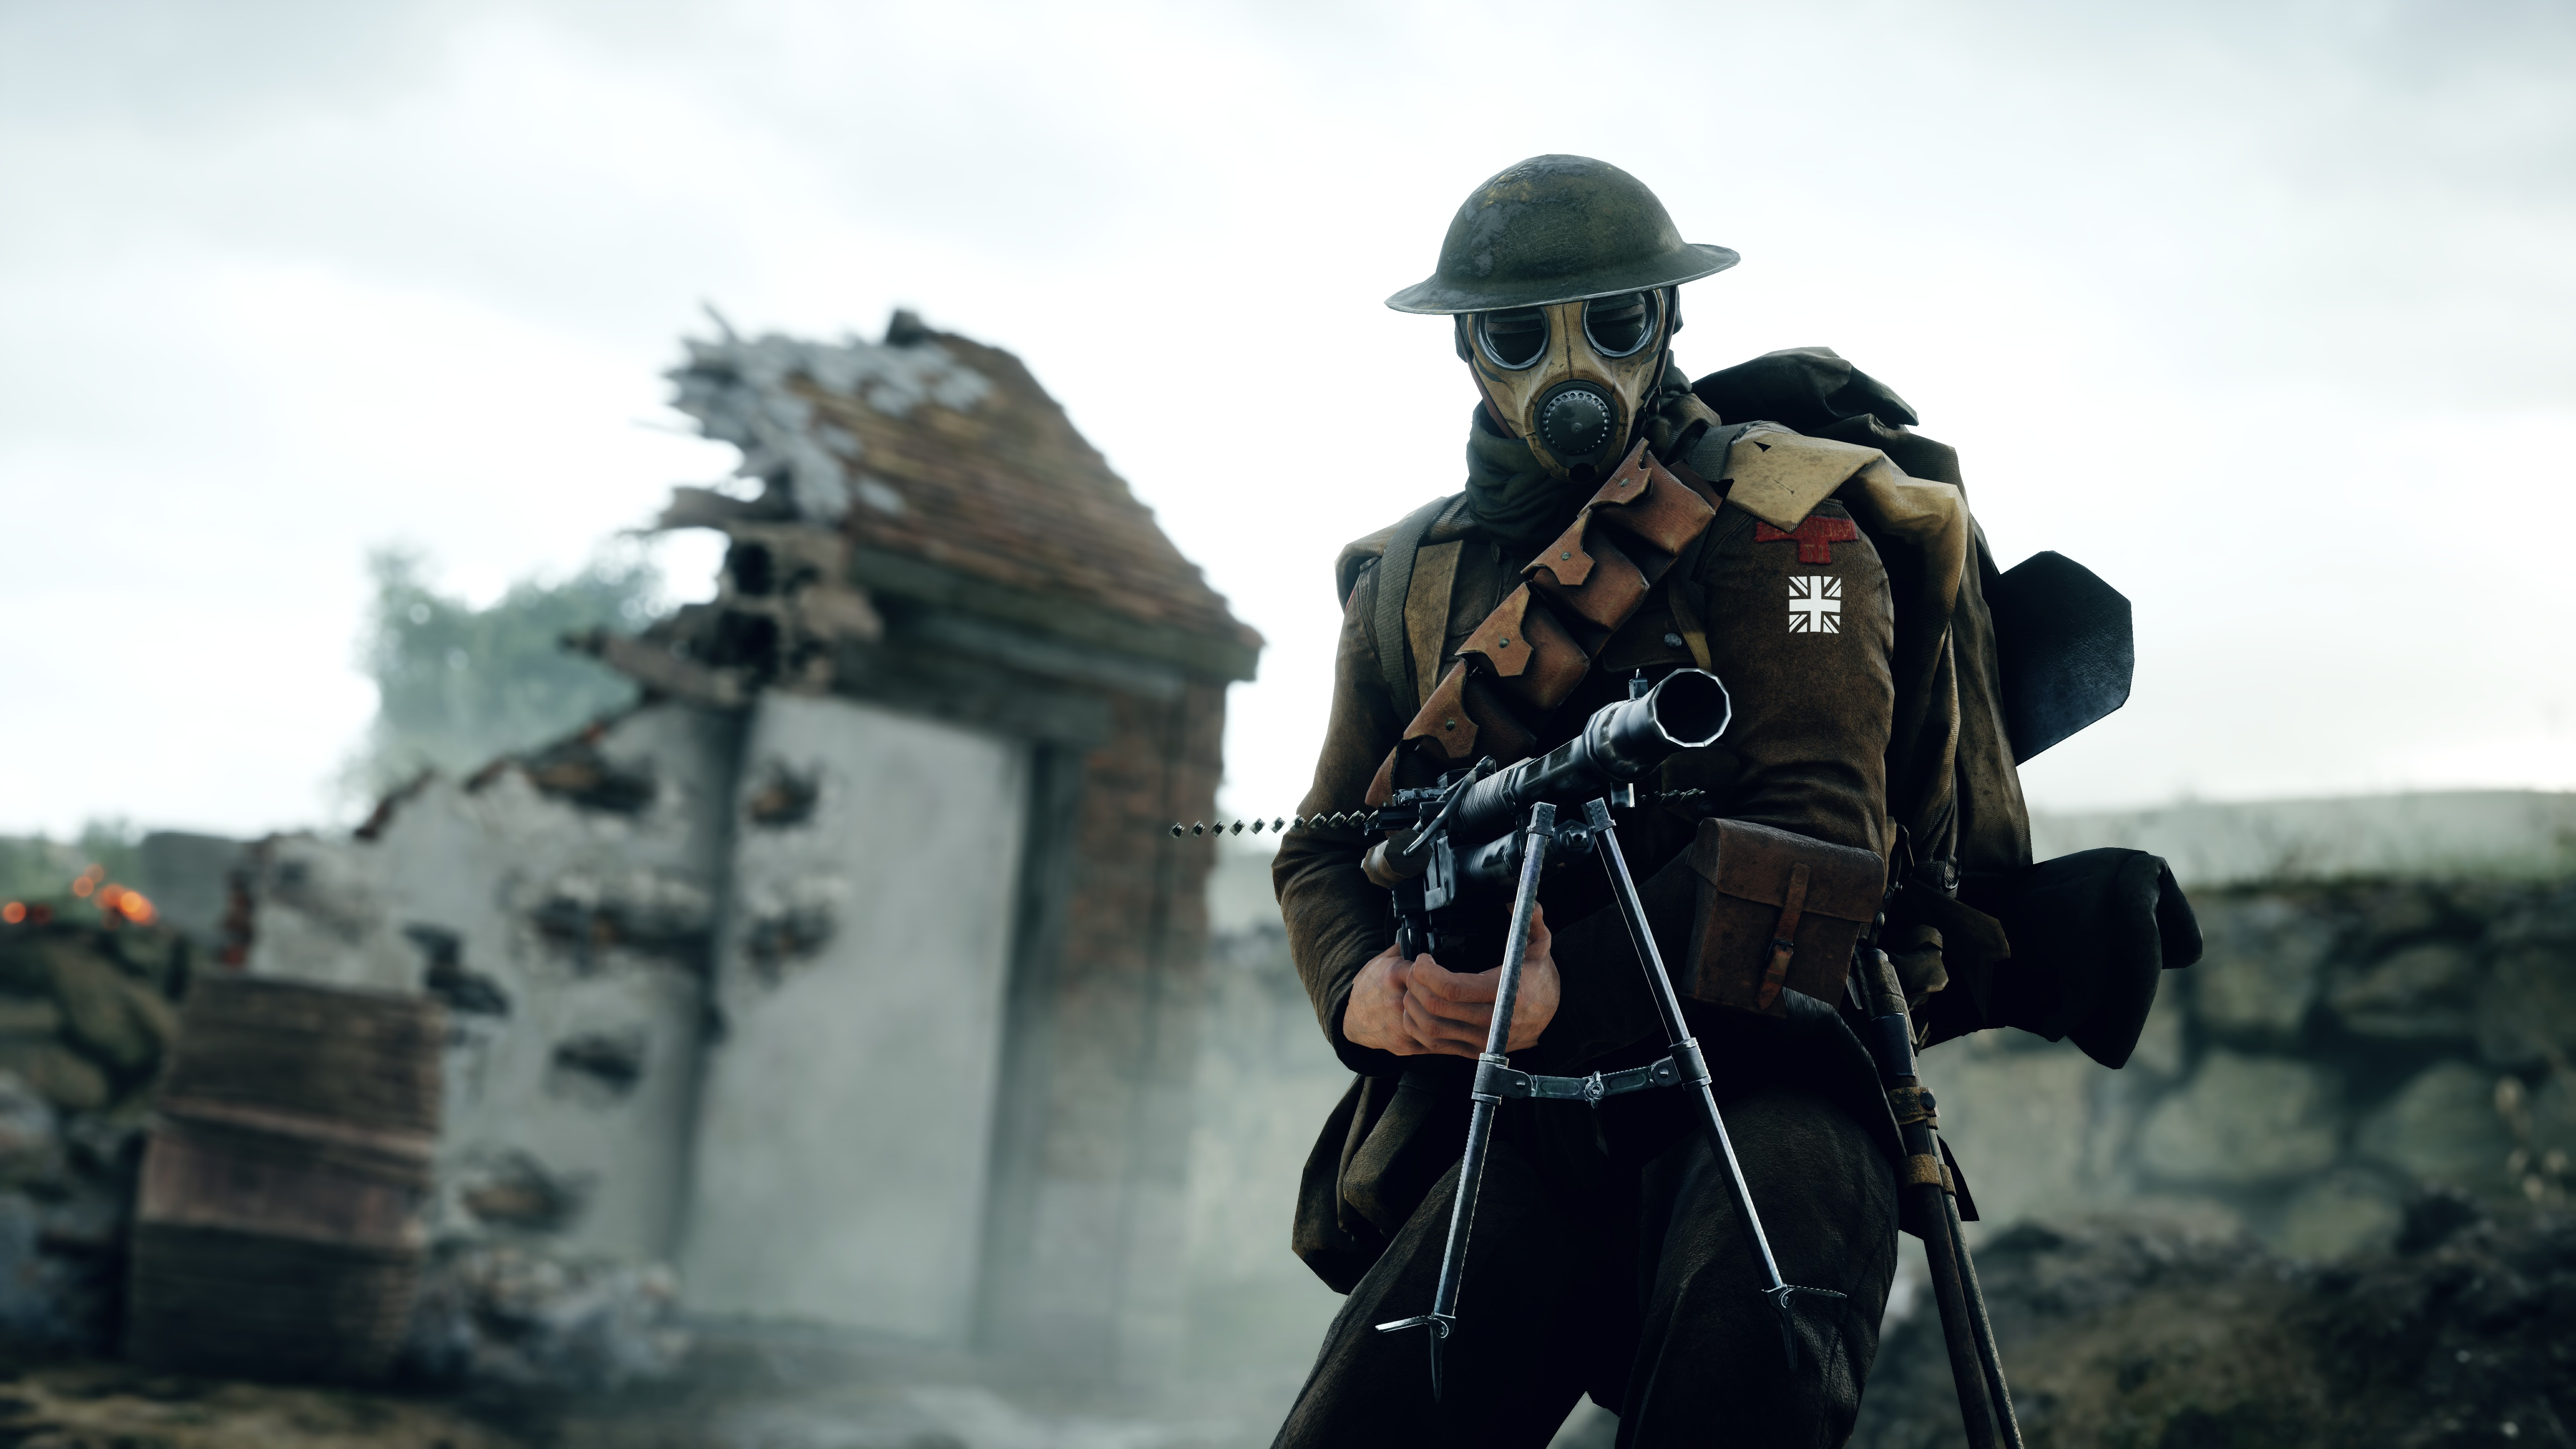 Battlefield 1 Soldier 4k, HD Games, 4k Wallpapers, Images ...